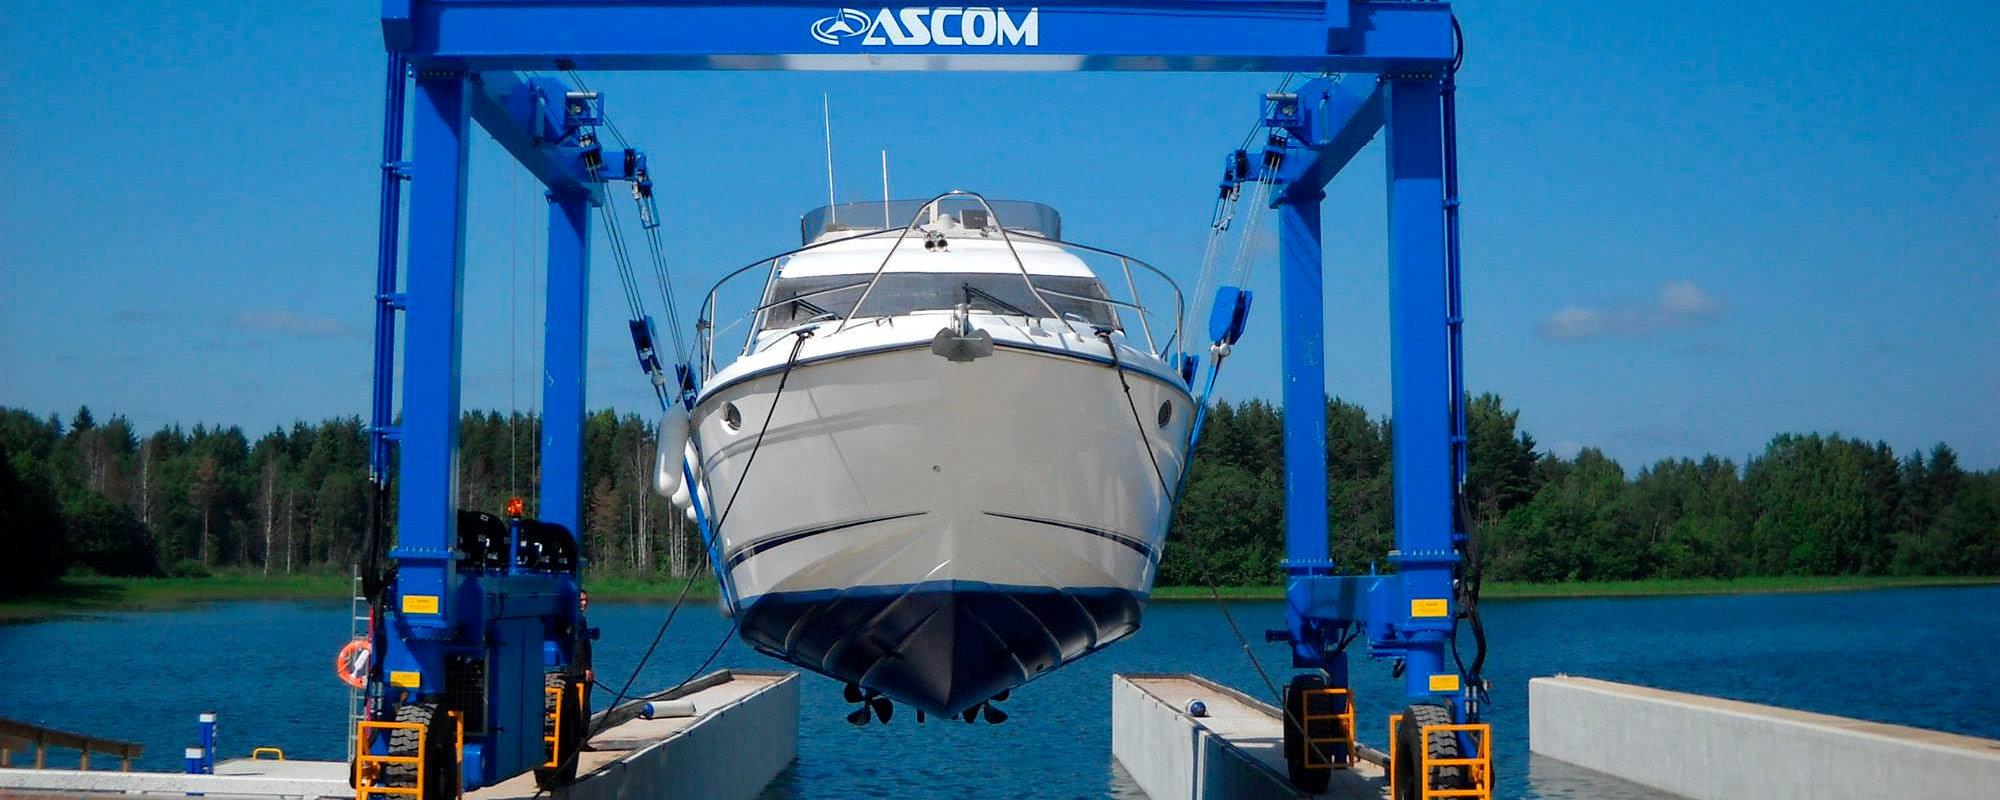 Зимнее хранение яхт